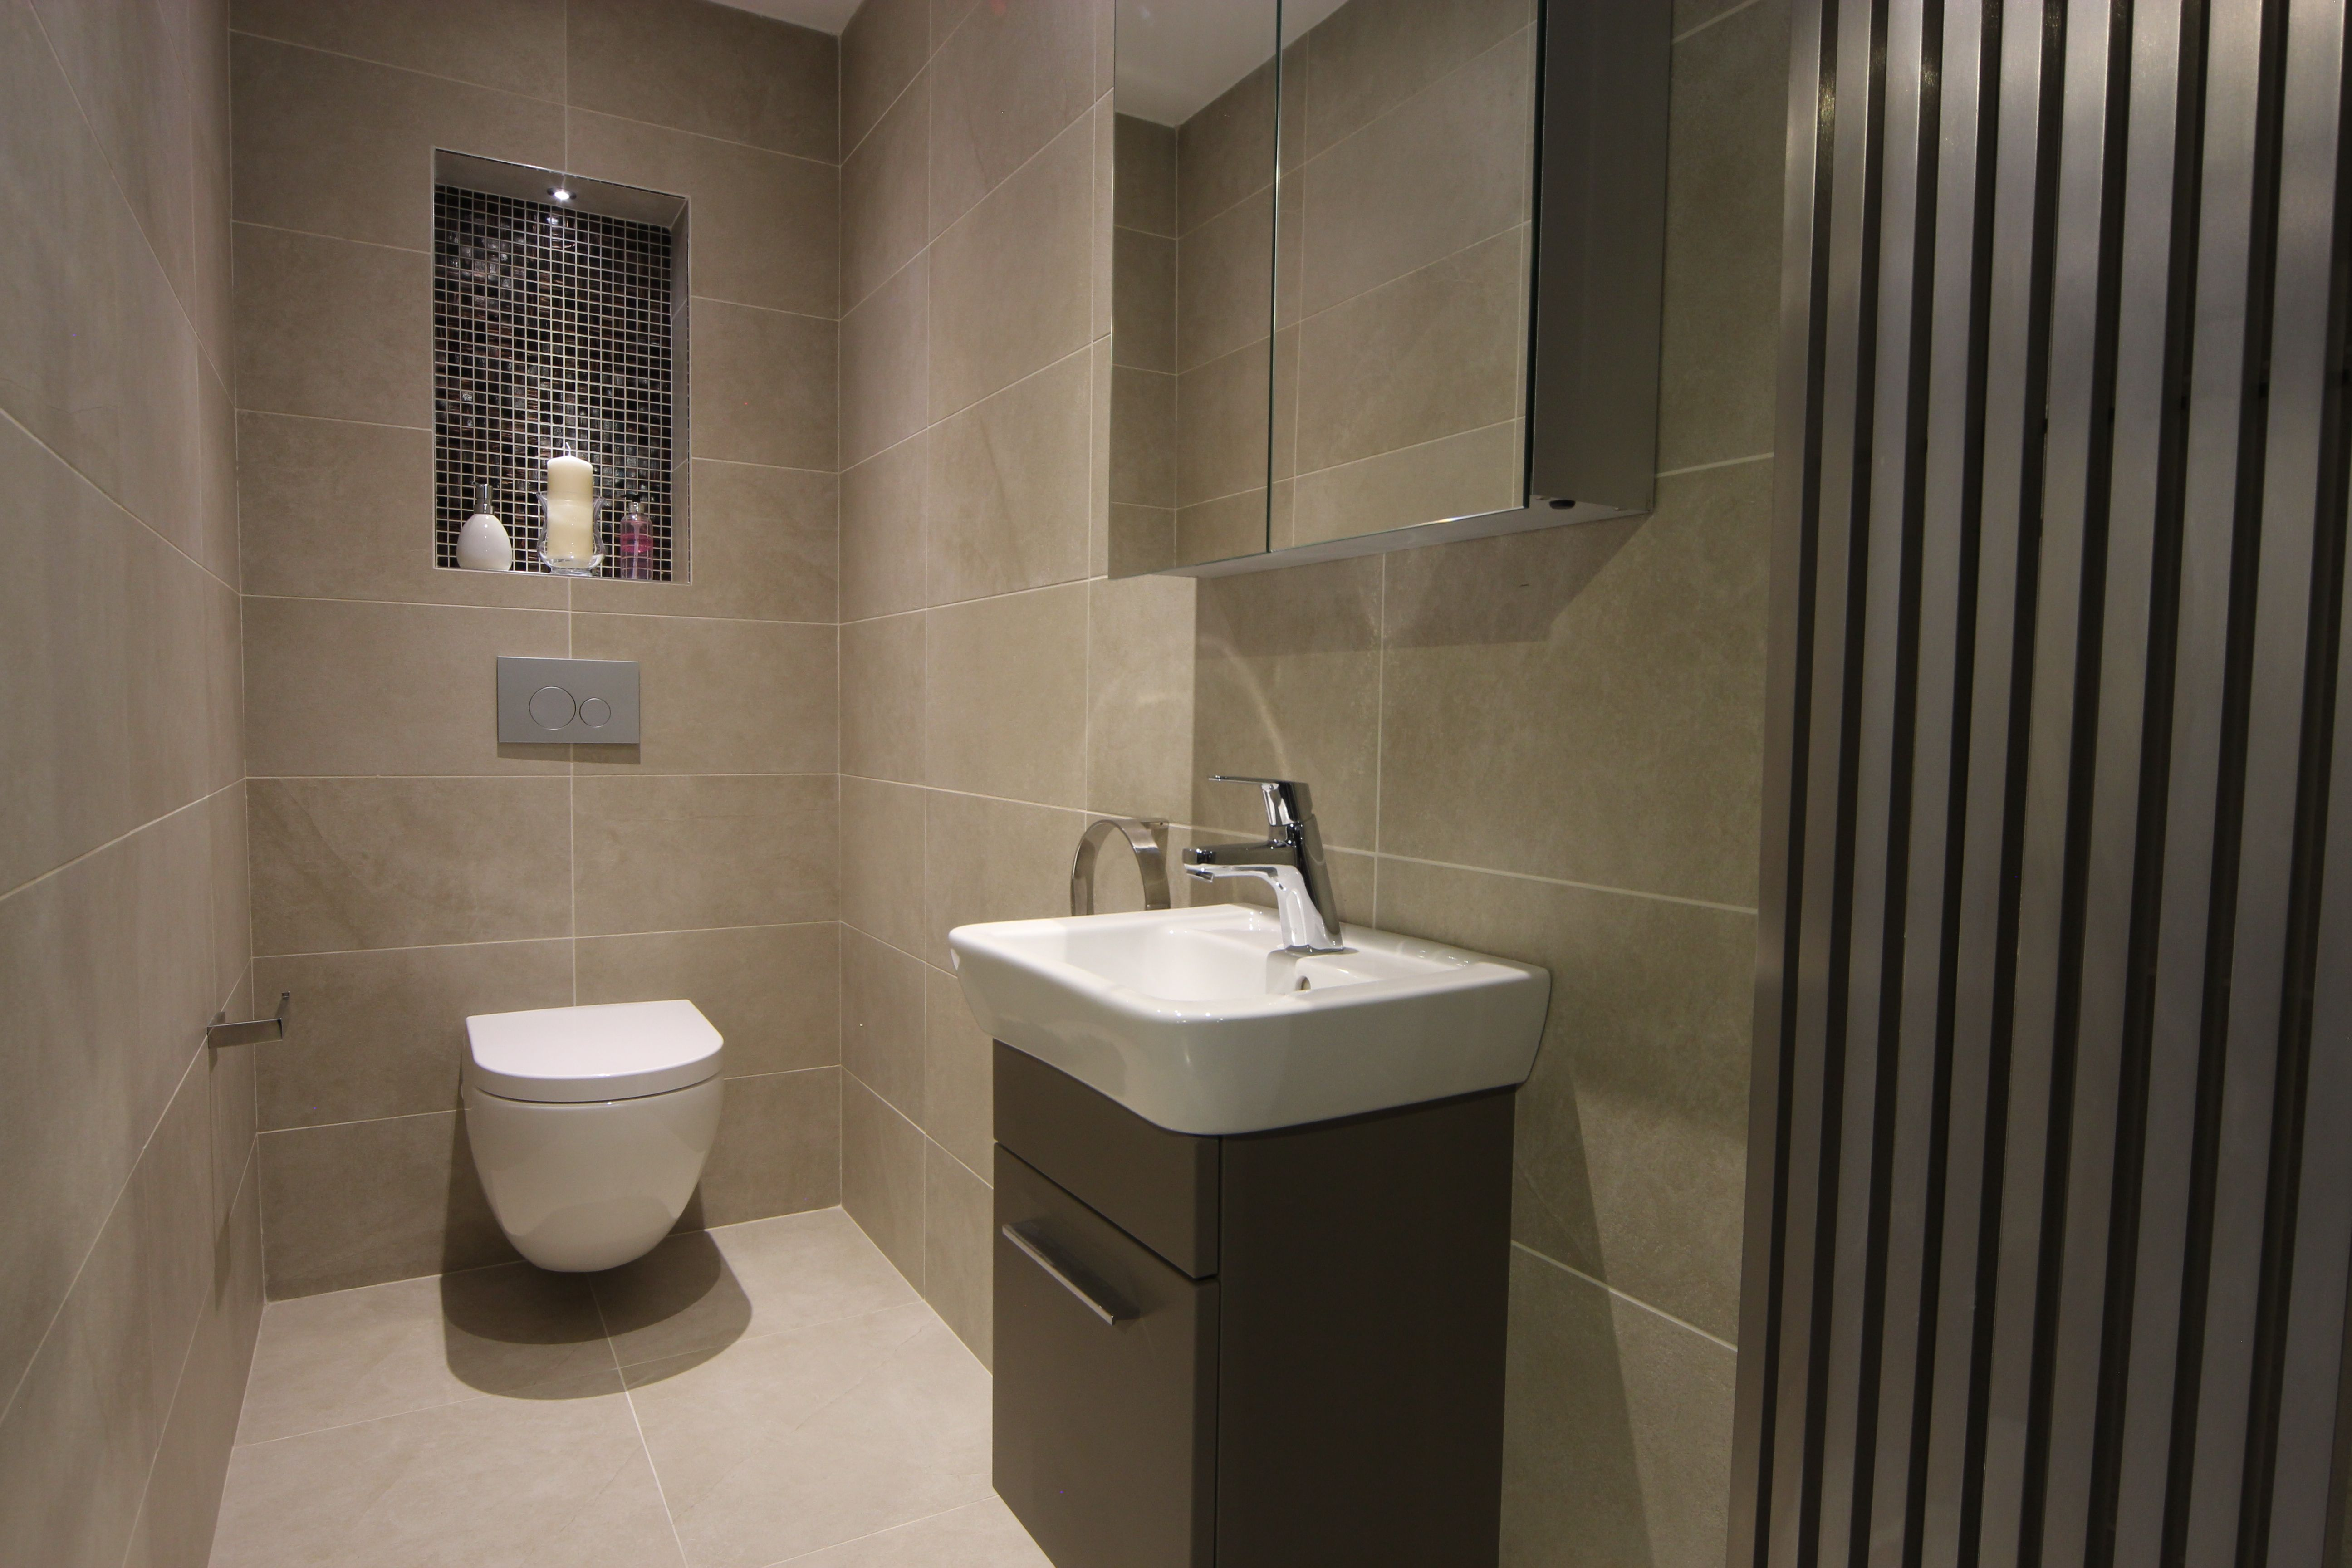 Bathroom LED Lighting | Lighting manufacturers, Bathroom lighting, Bathroom